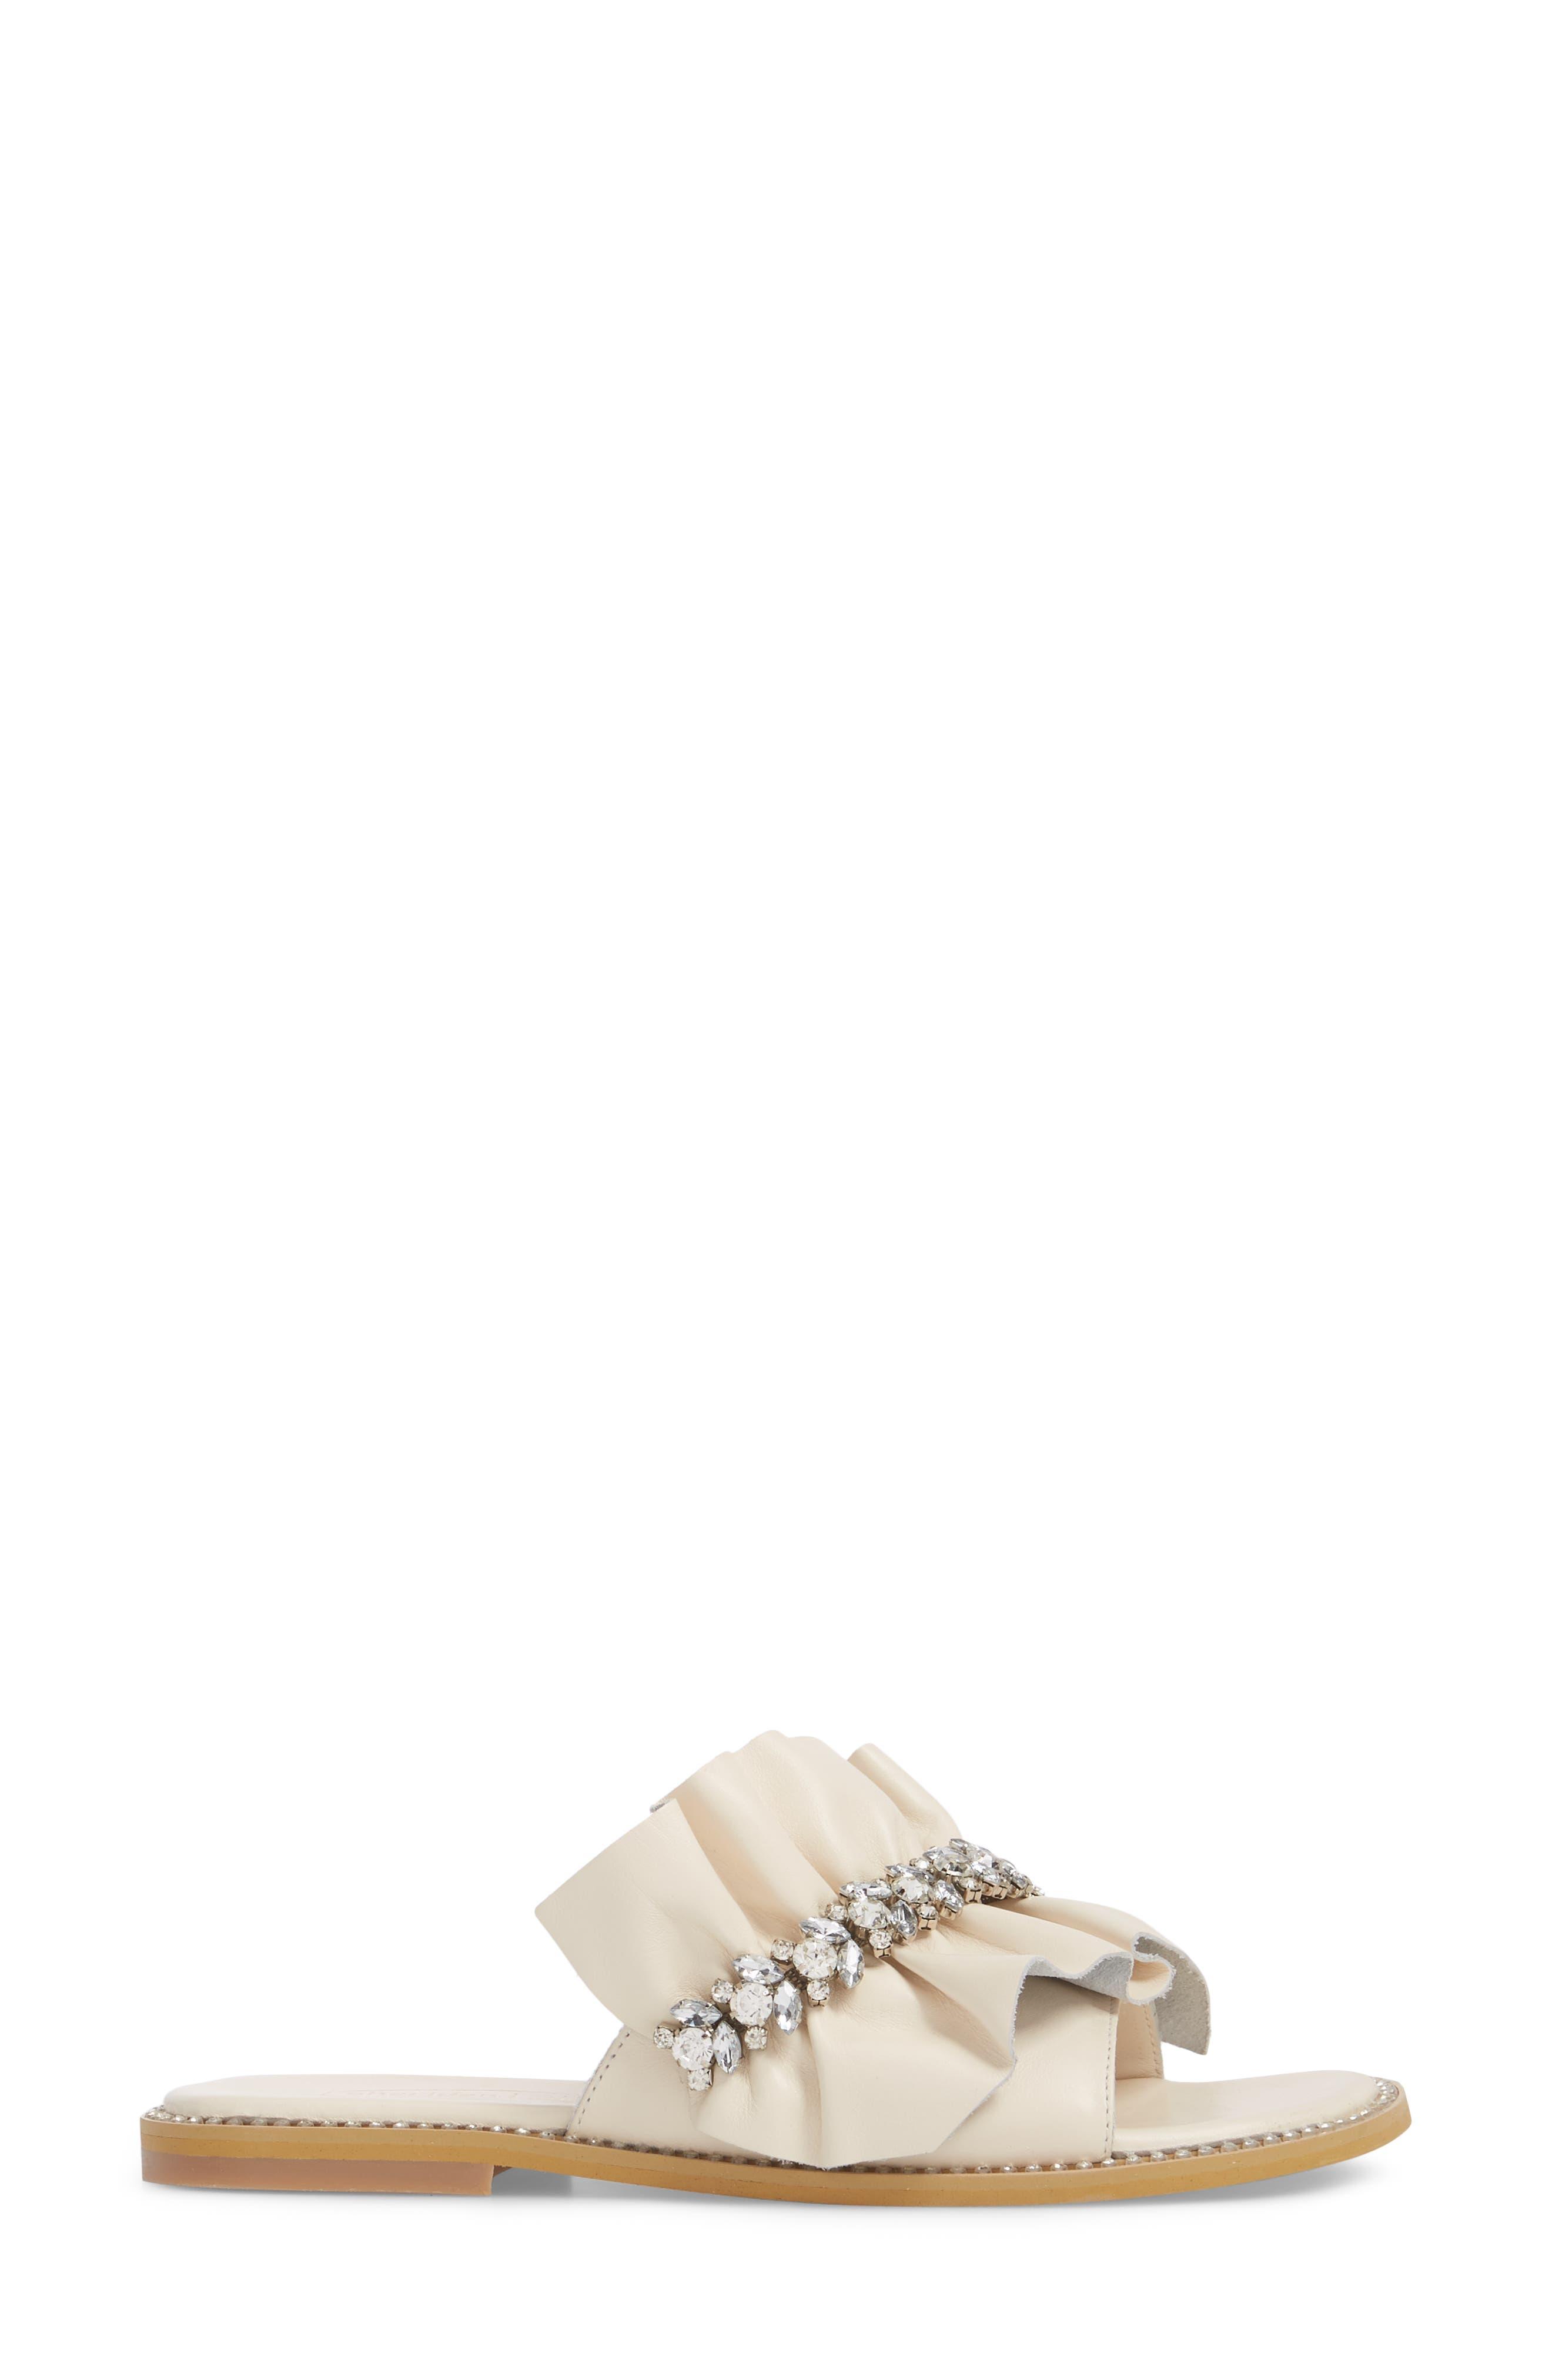 Tiana Crystal Slide Sandal,                             Alternate thumbnail 3, color,                             Cream Leather